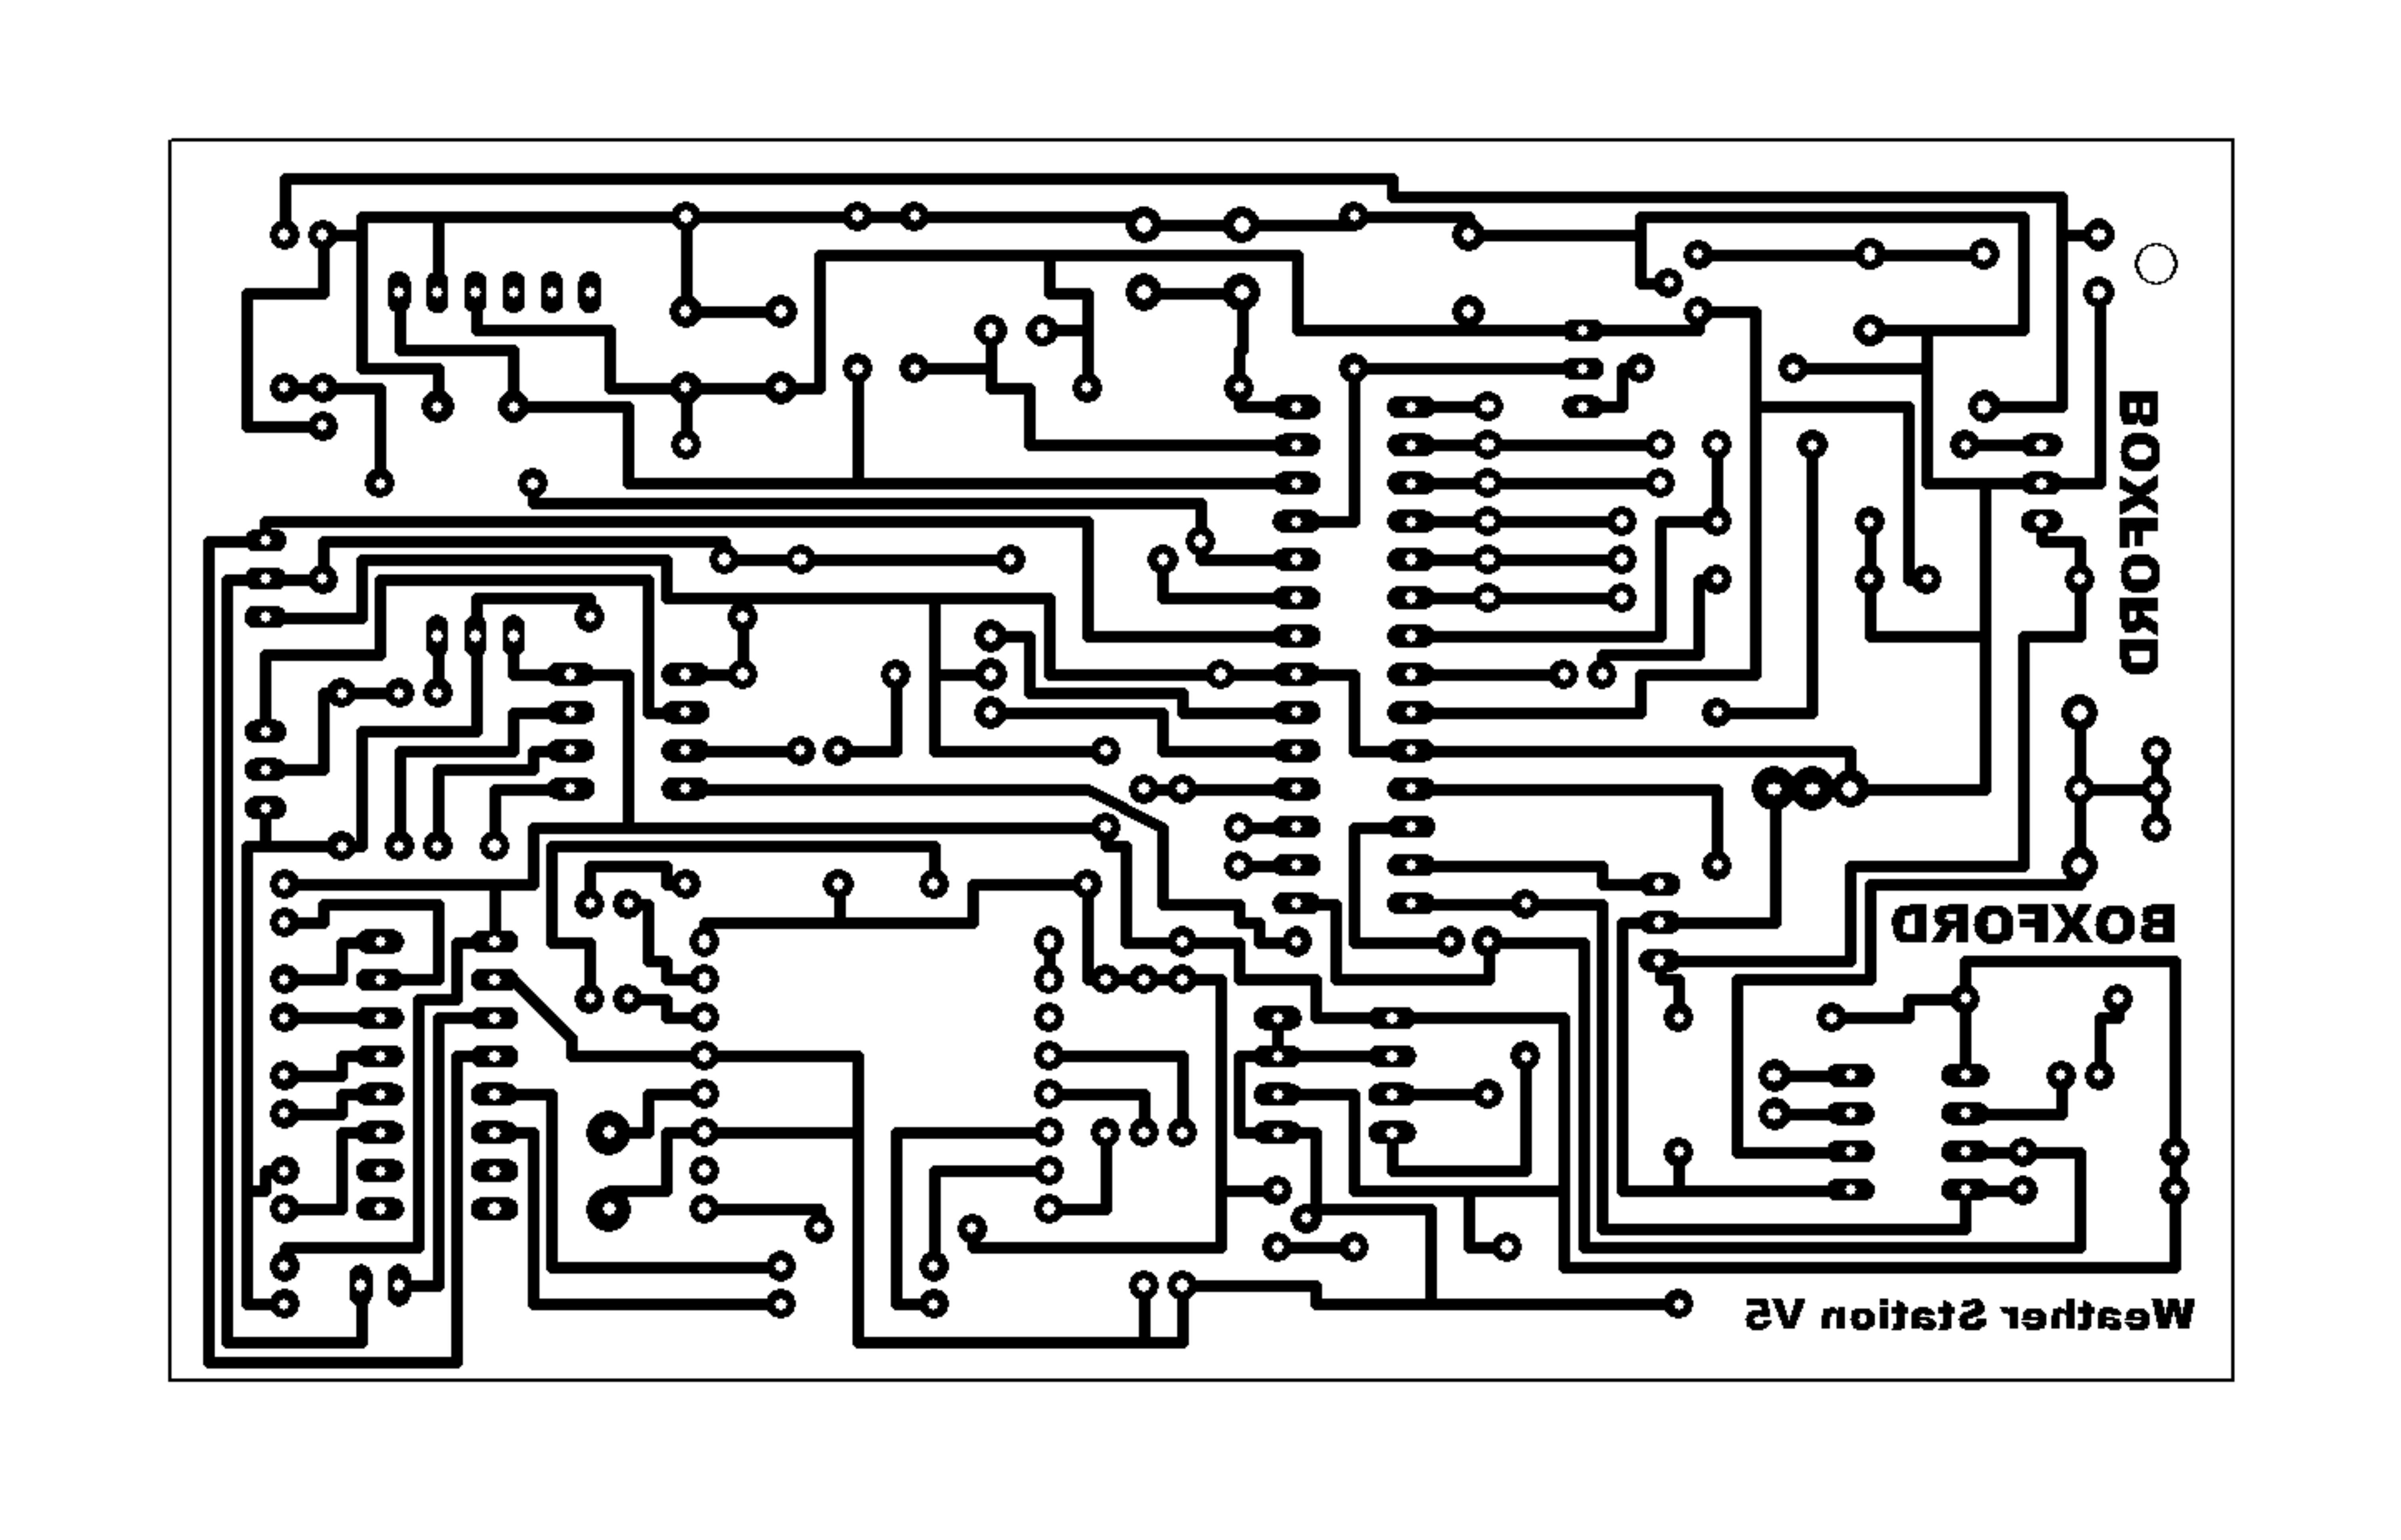 Boxford Resources System Rain Detector Circuit Schematic Diagram Artwork